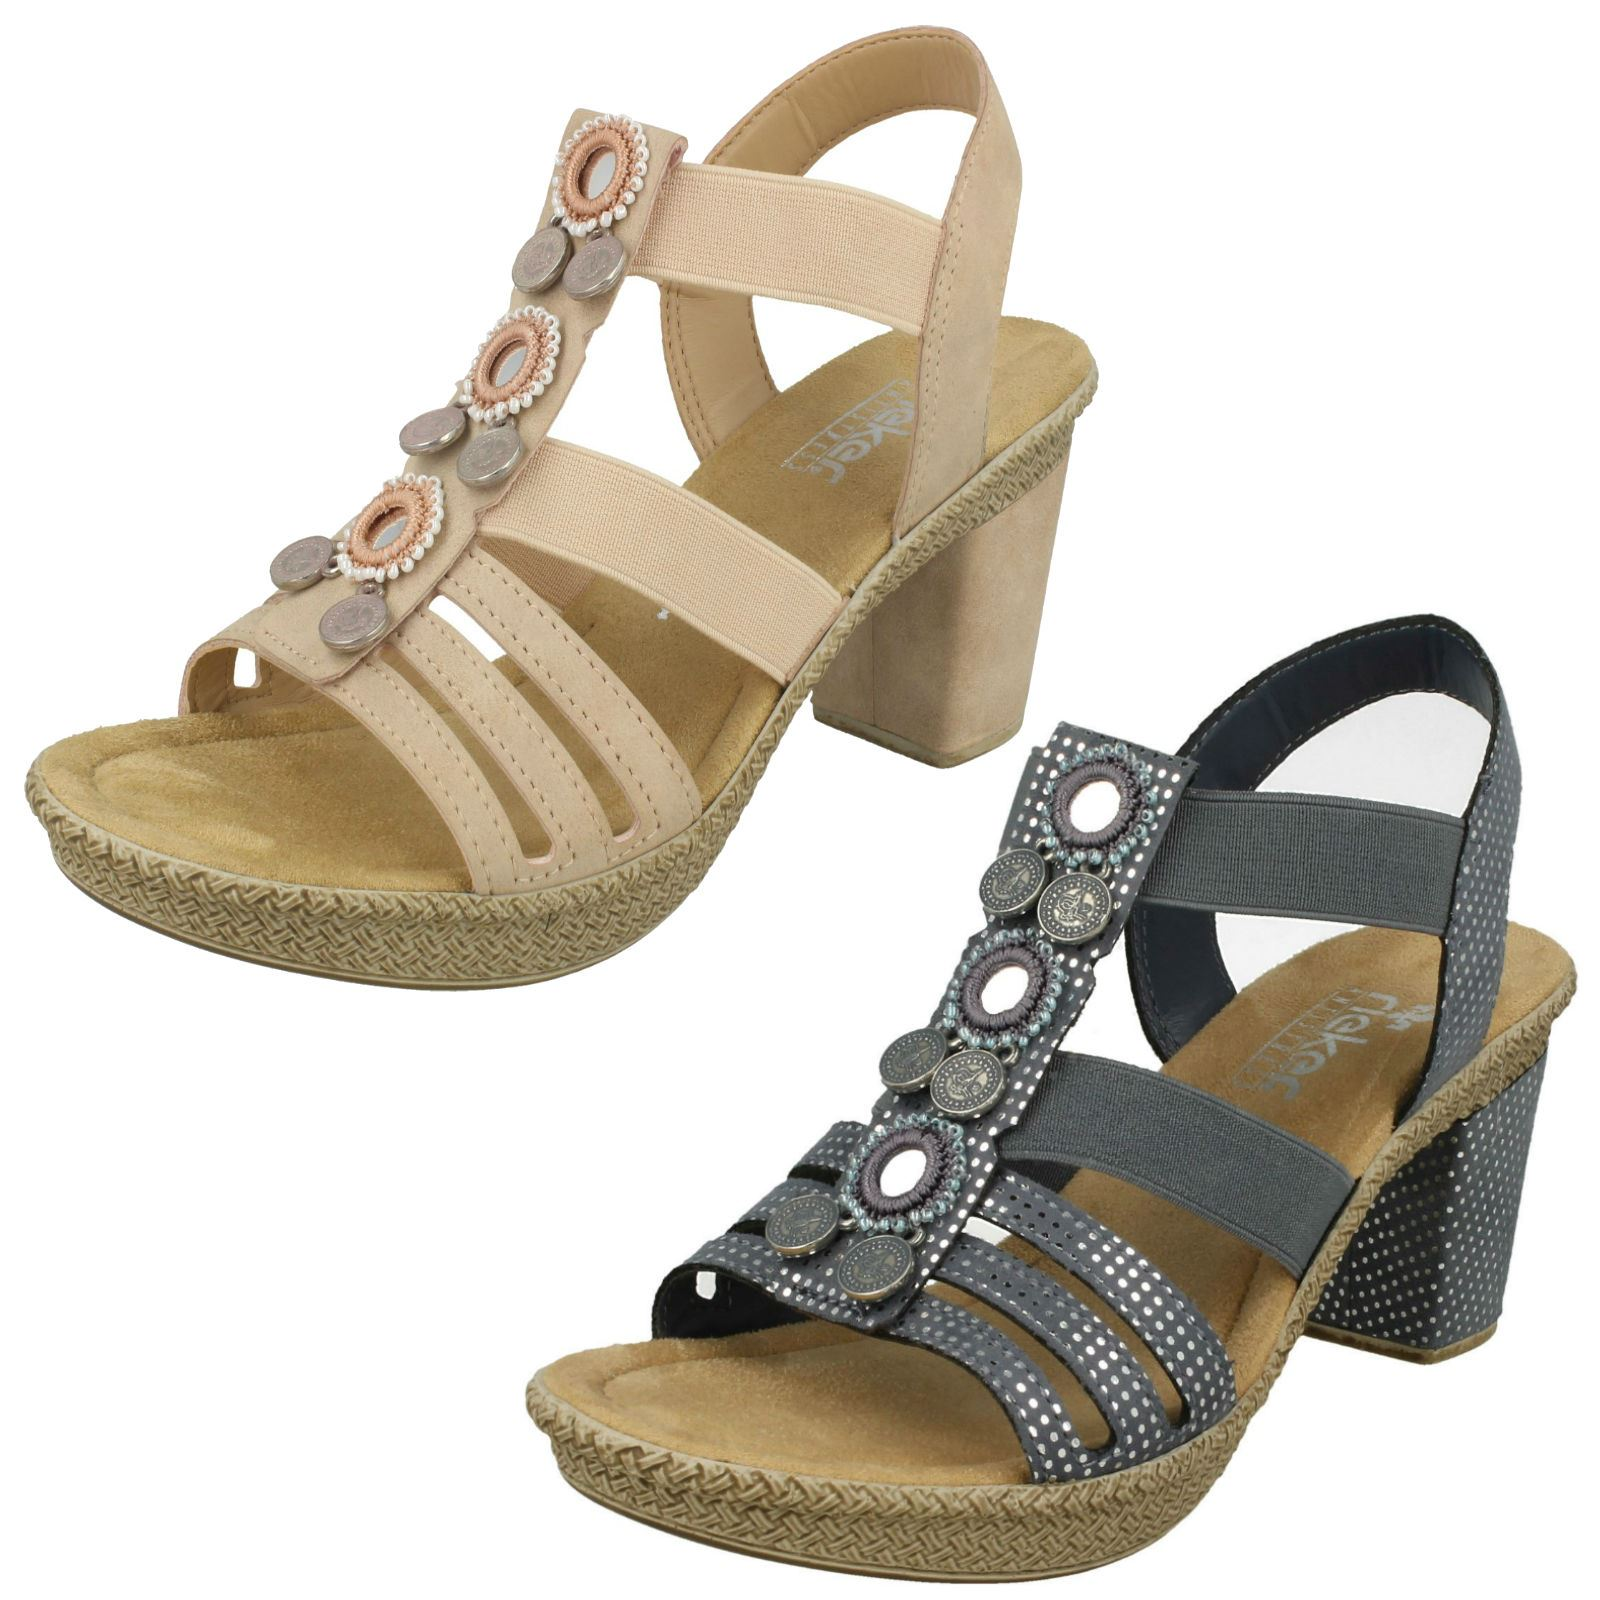 741a3cd0461c2 Image is loading Rieker-Ladies-Slingback-Heeled-Sandals-66527